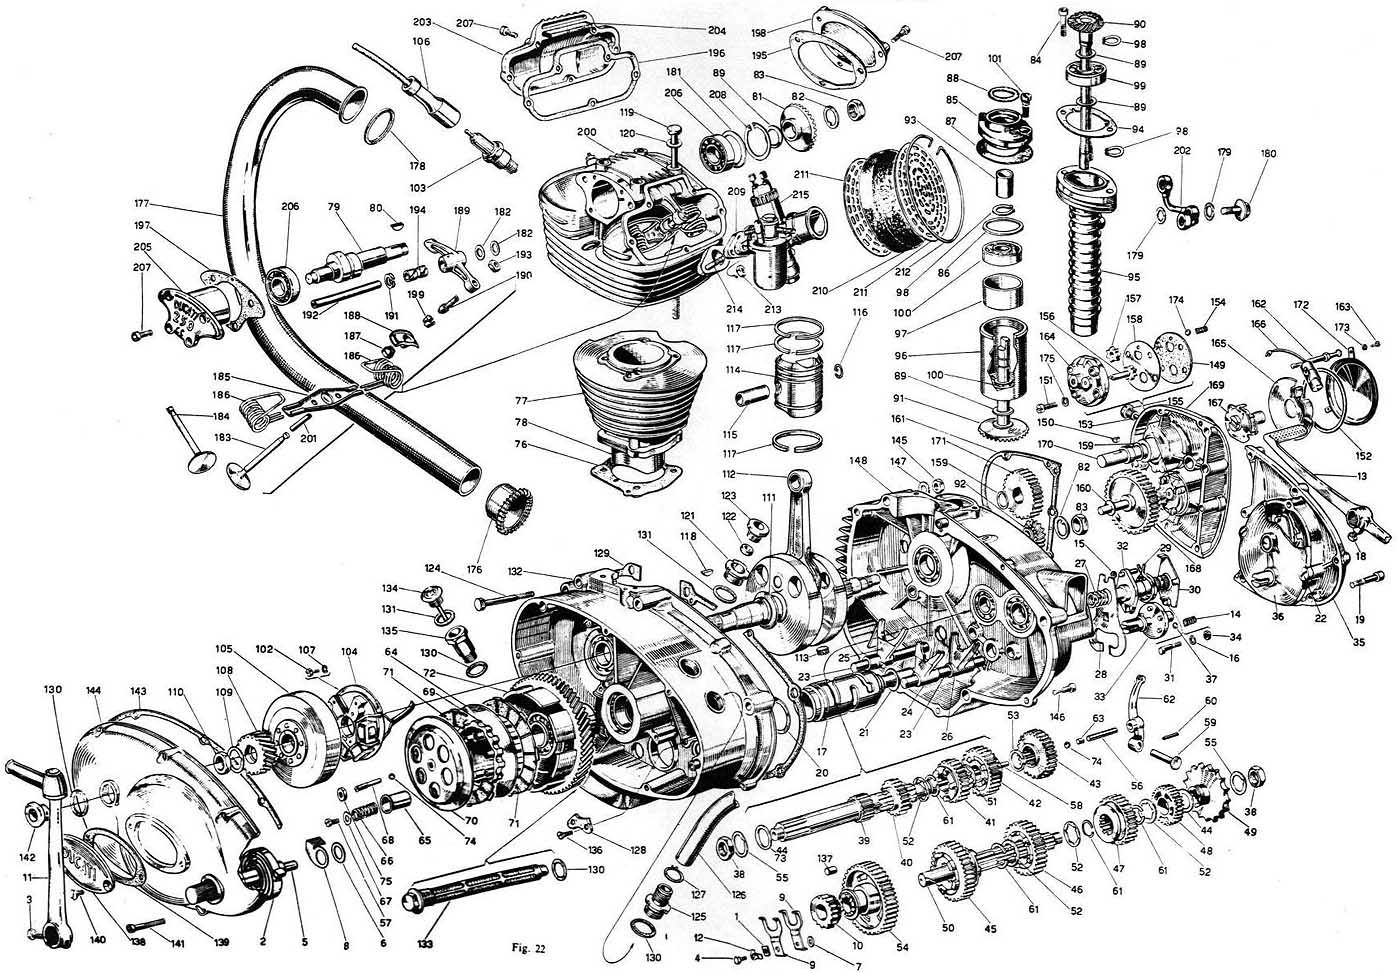 shovelhead engine diagram john deere 316 wiring pdf barking mad speed shop these are great diagrams